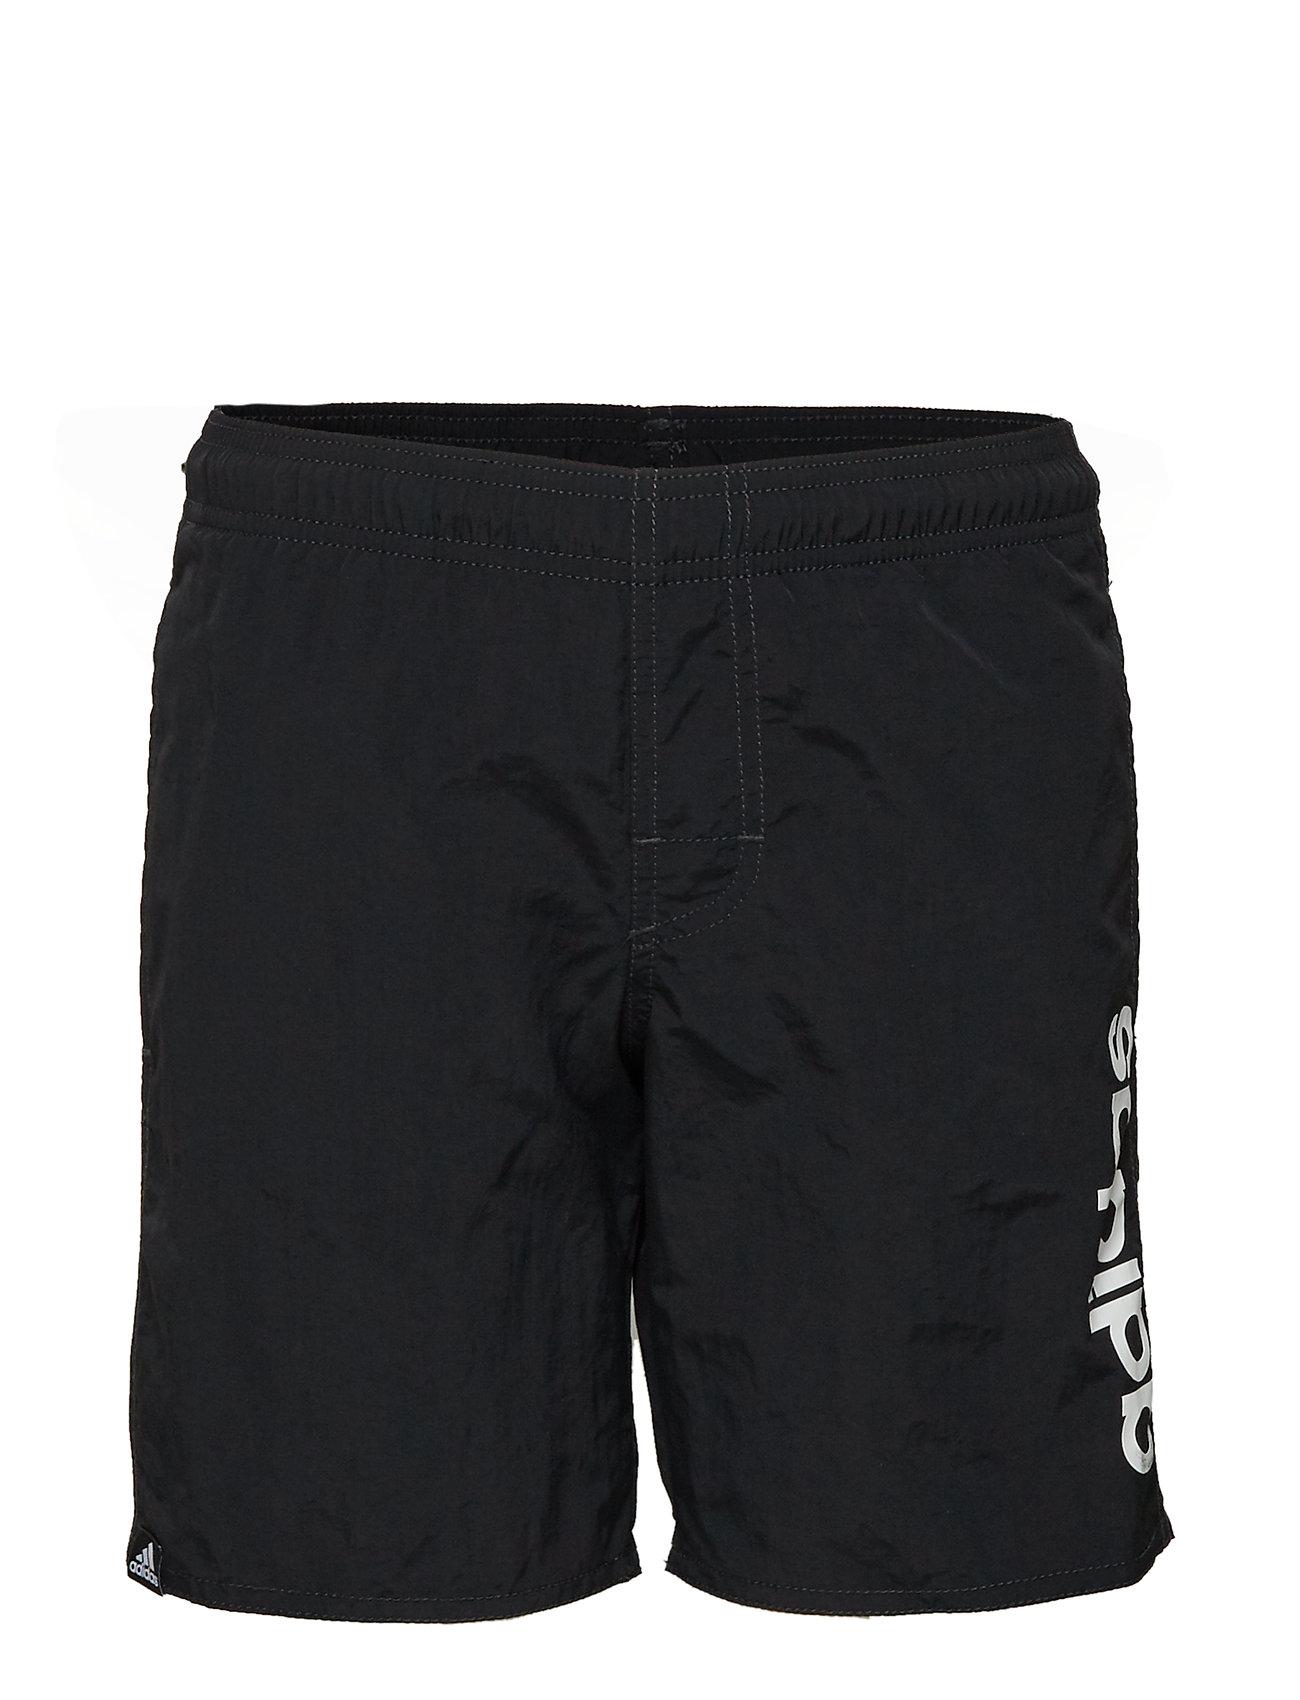 adidas Performance YB LIN SH CL - BLACK